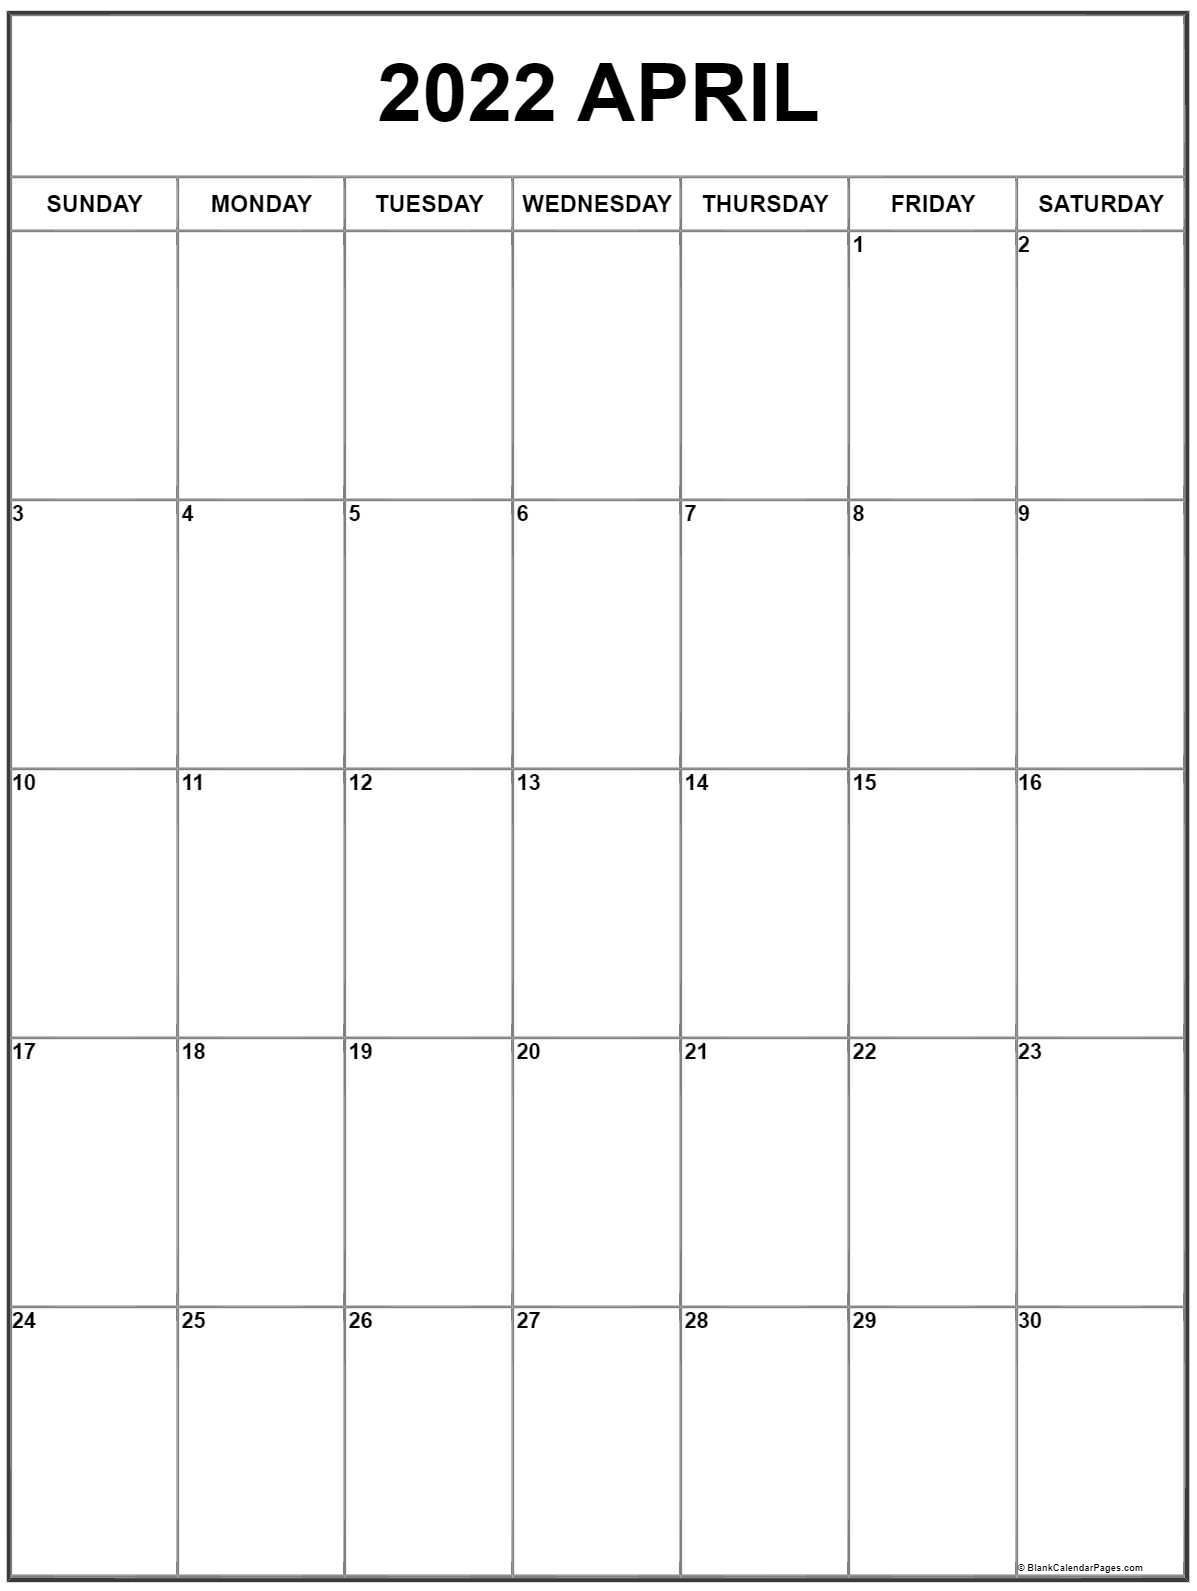 April 2022 Vertical Calendar